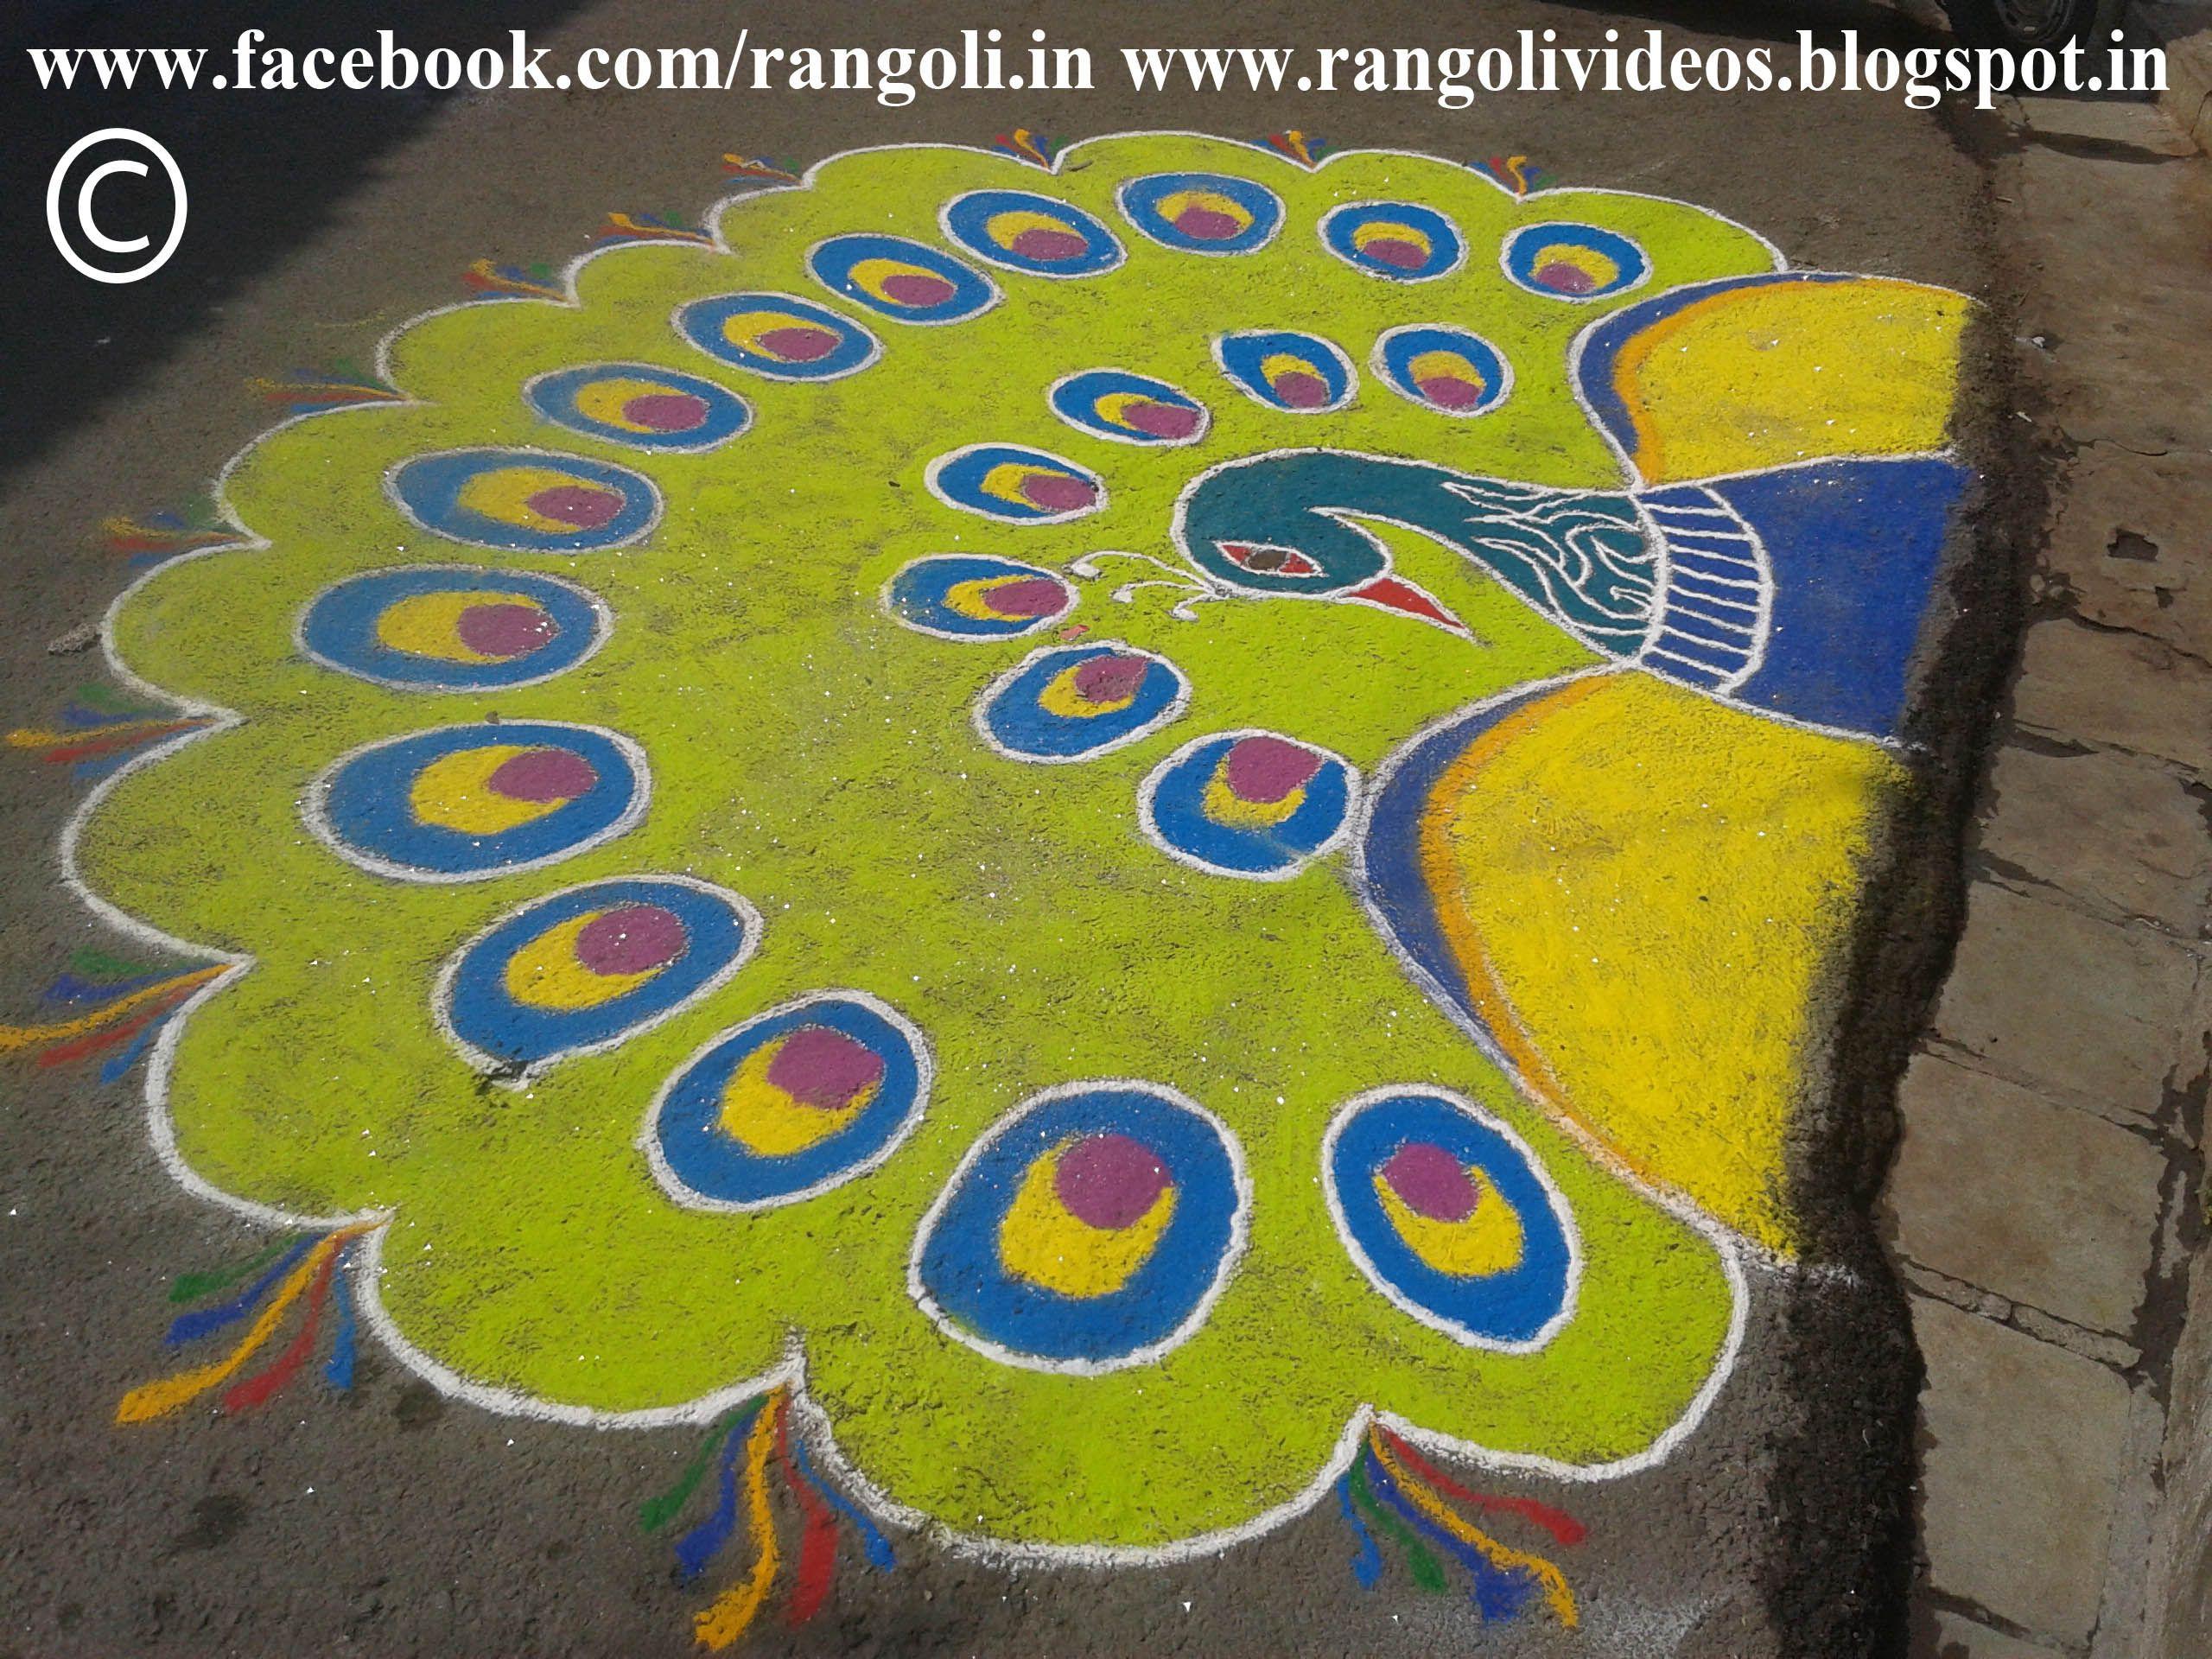 Amazing Rangoli Designs With Theme Go for Rangoli Designs With Theme Go Green  181obs